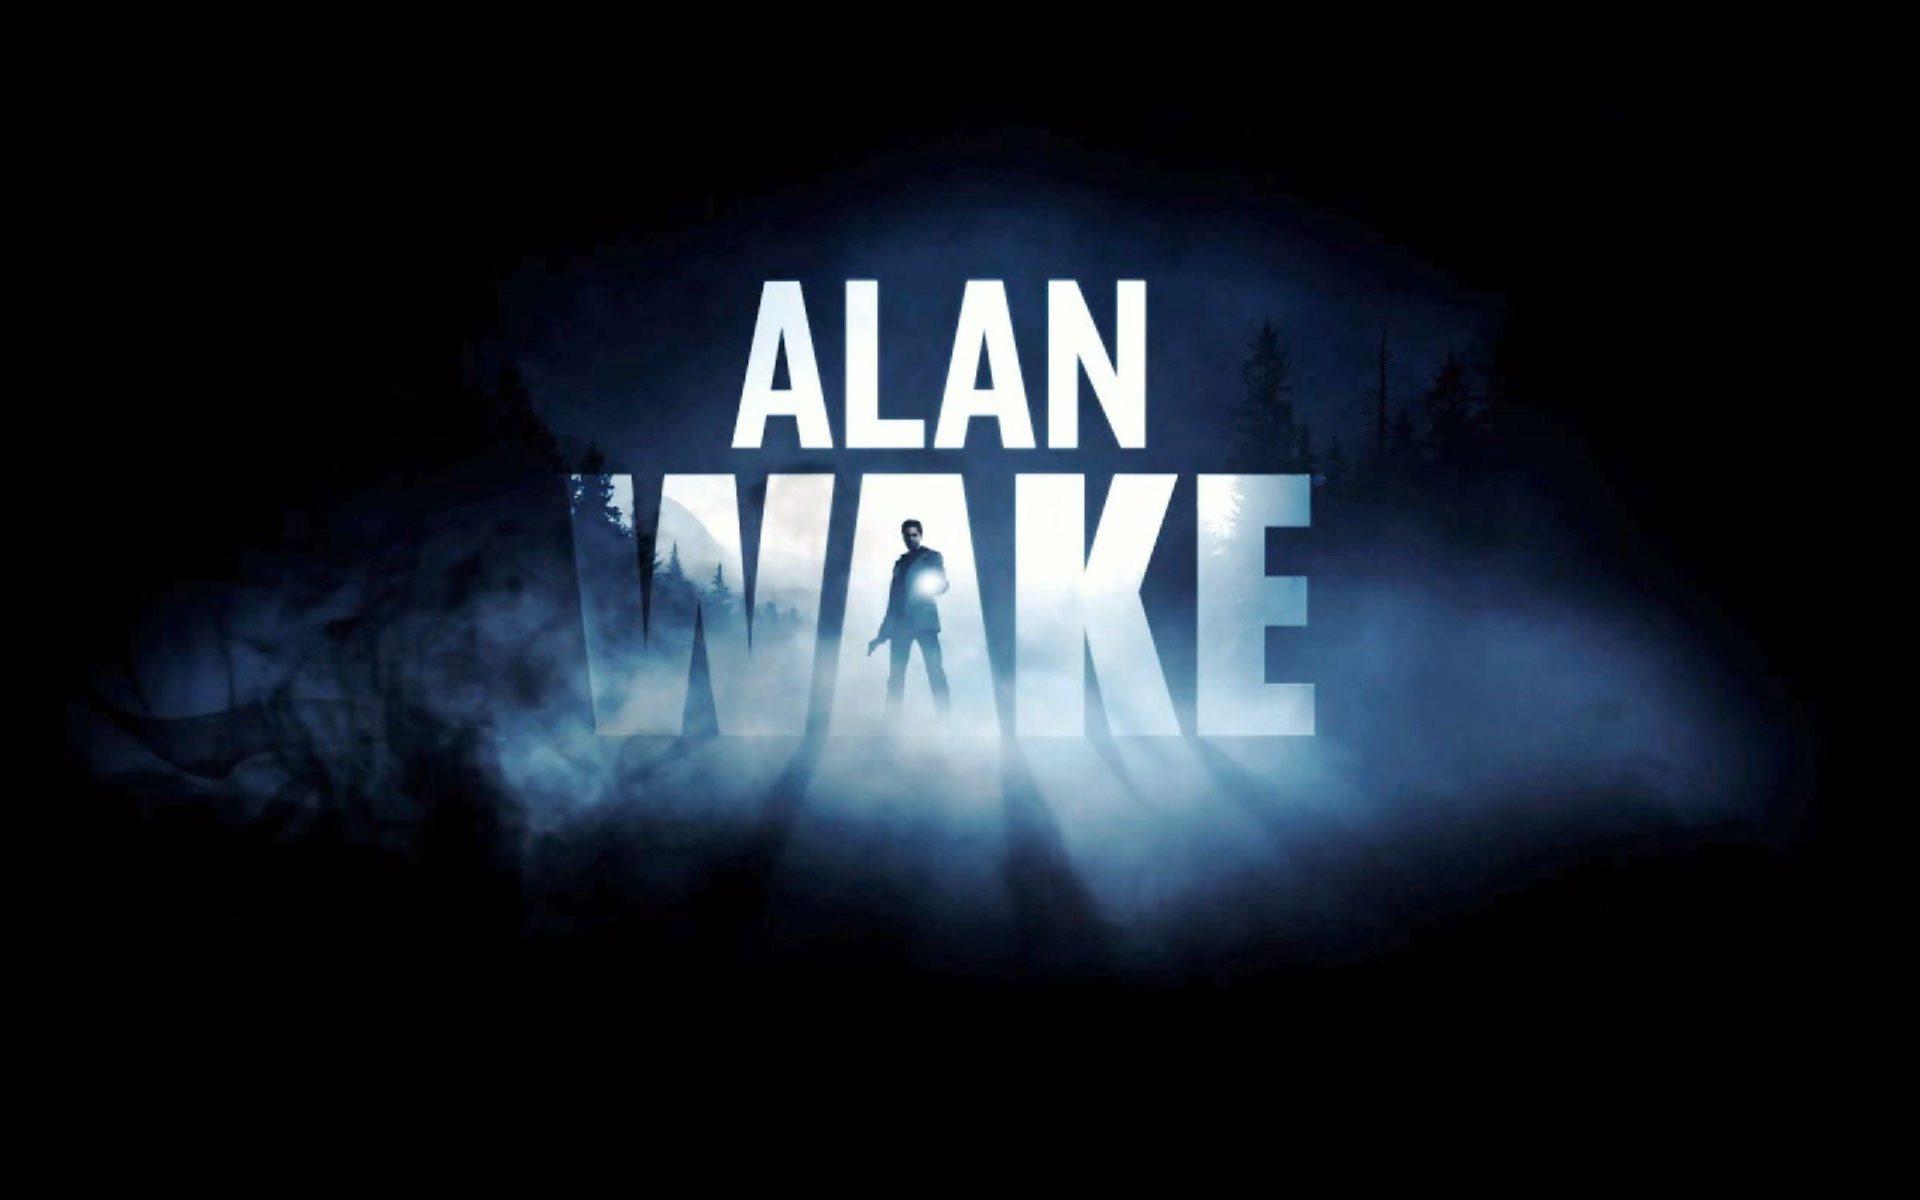 serie tv alan wake